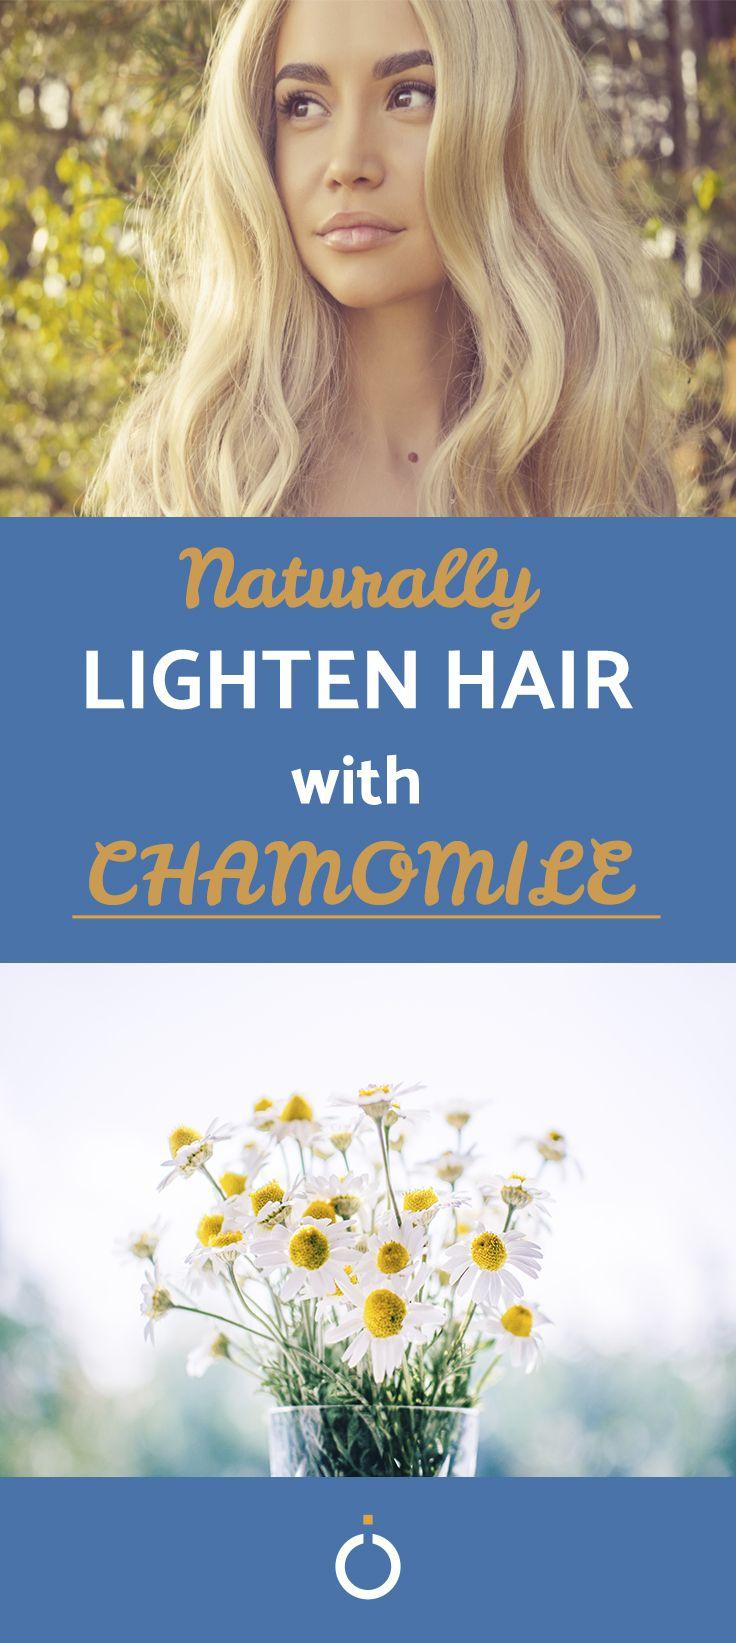 How to lighten hair with chamomile tea lighten hair